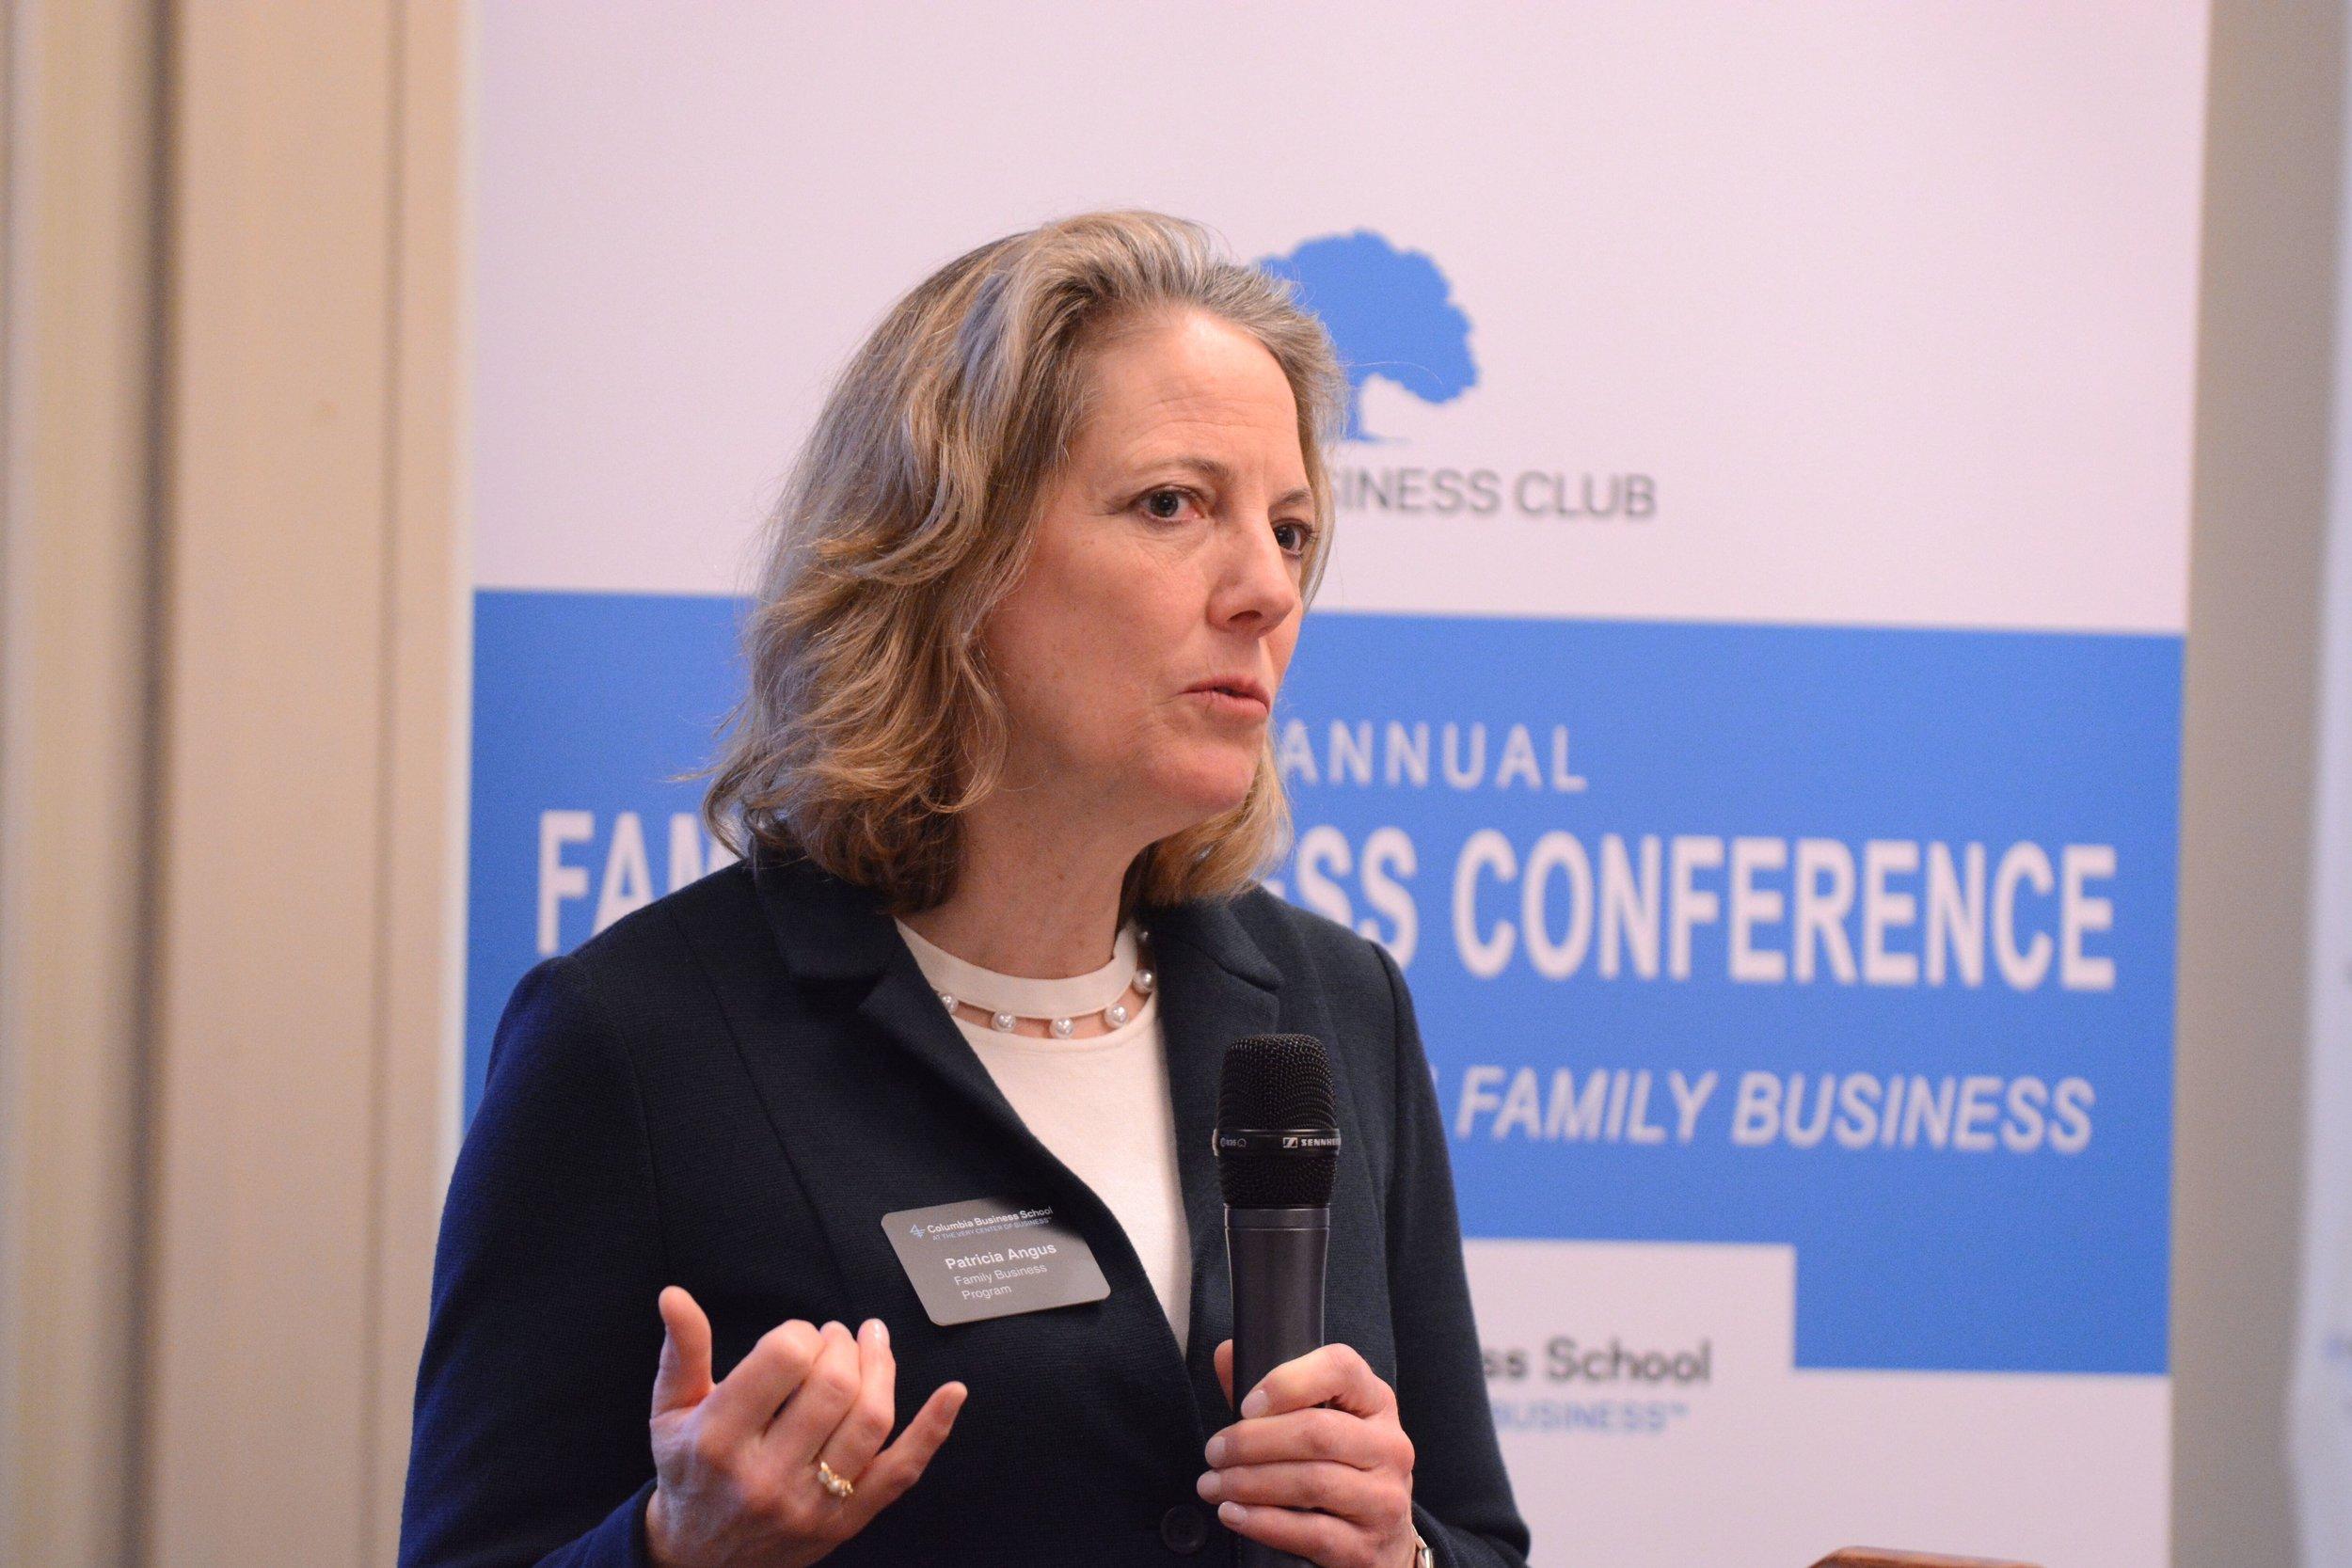 Professor Patricia Angus